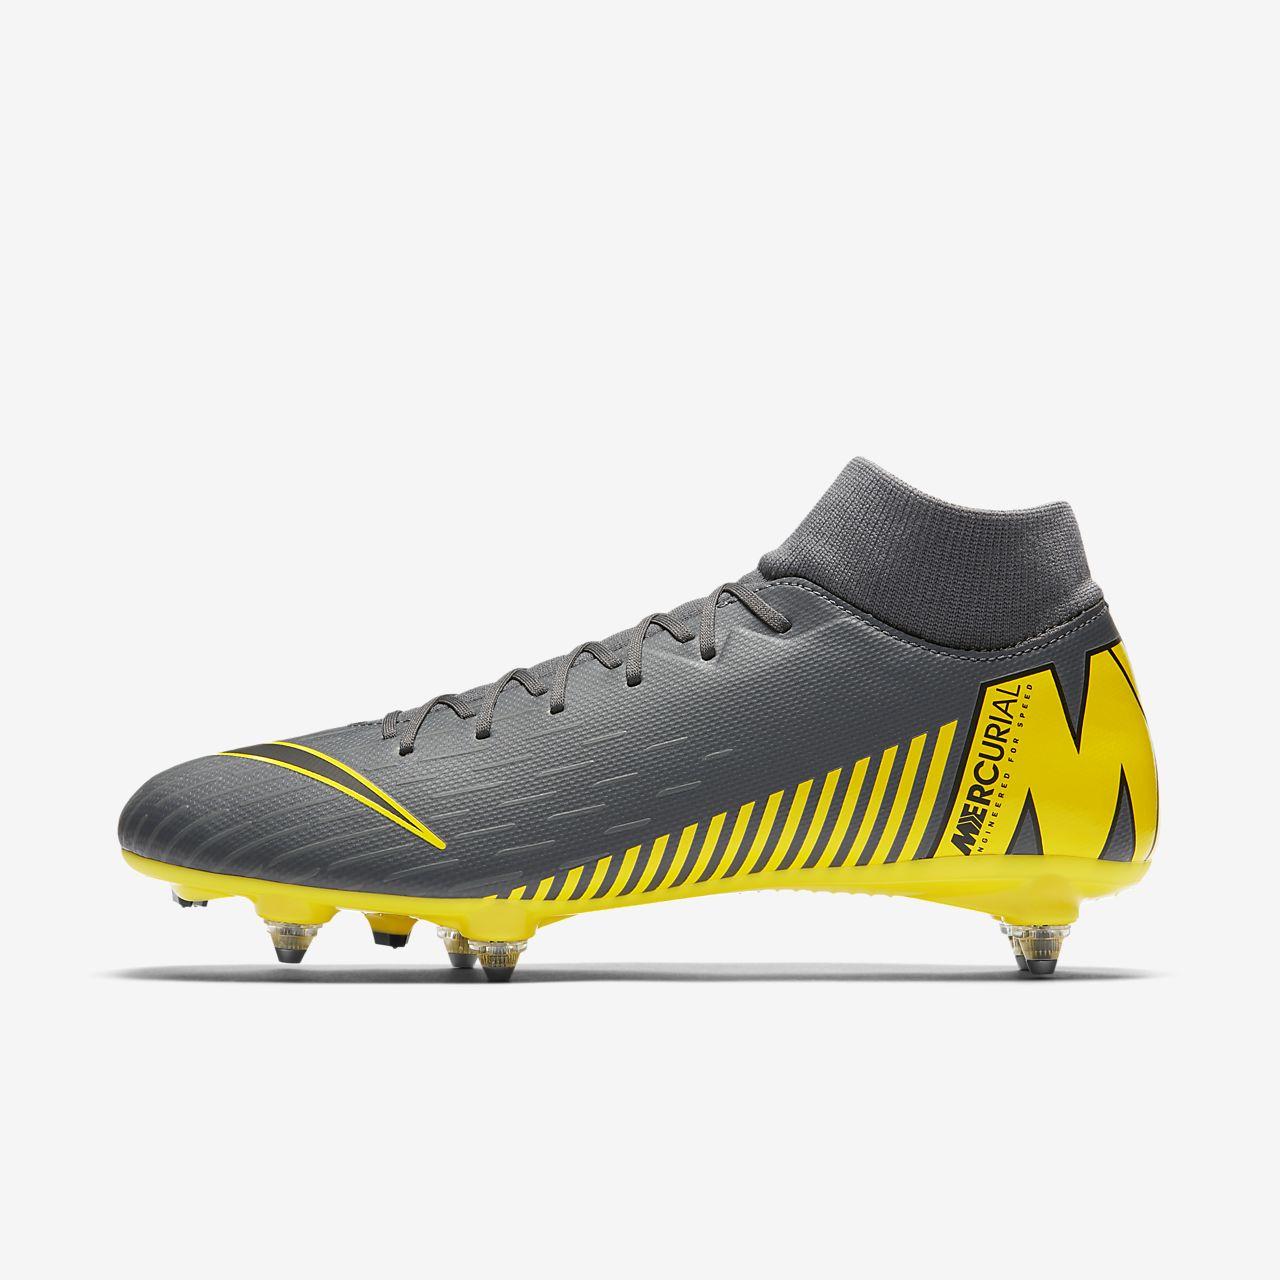 Nike Mercurial Superfly VI Academy SG-PRO Soft-Ground Football Boot ... 0418ba7874